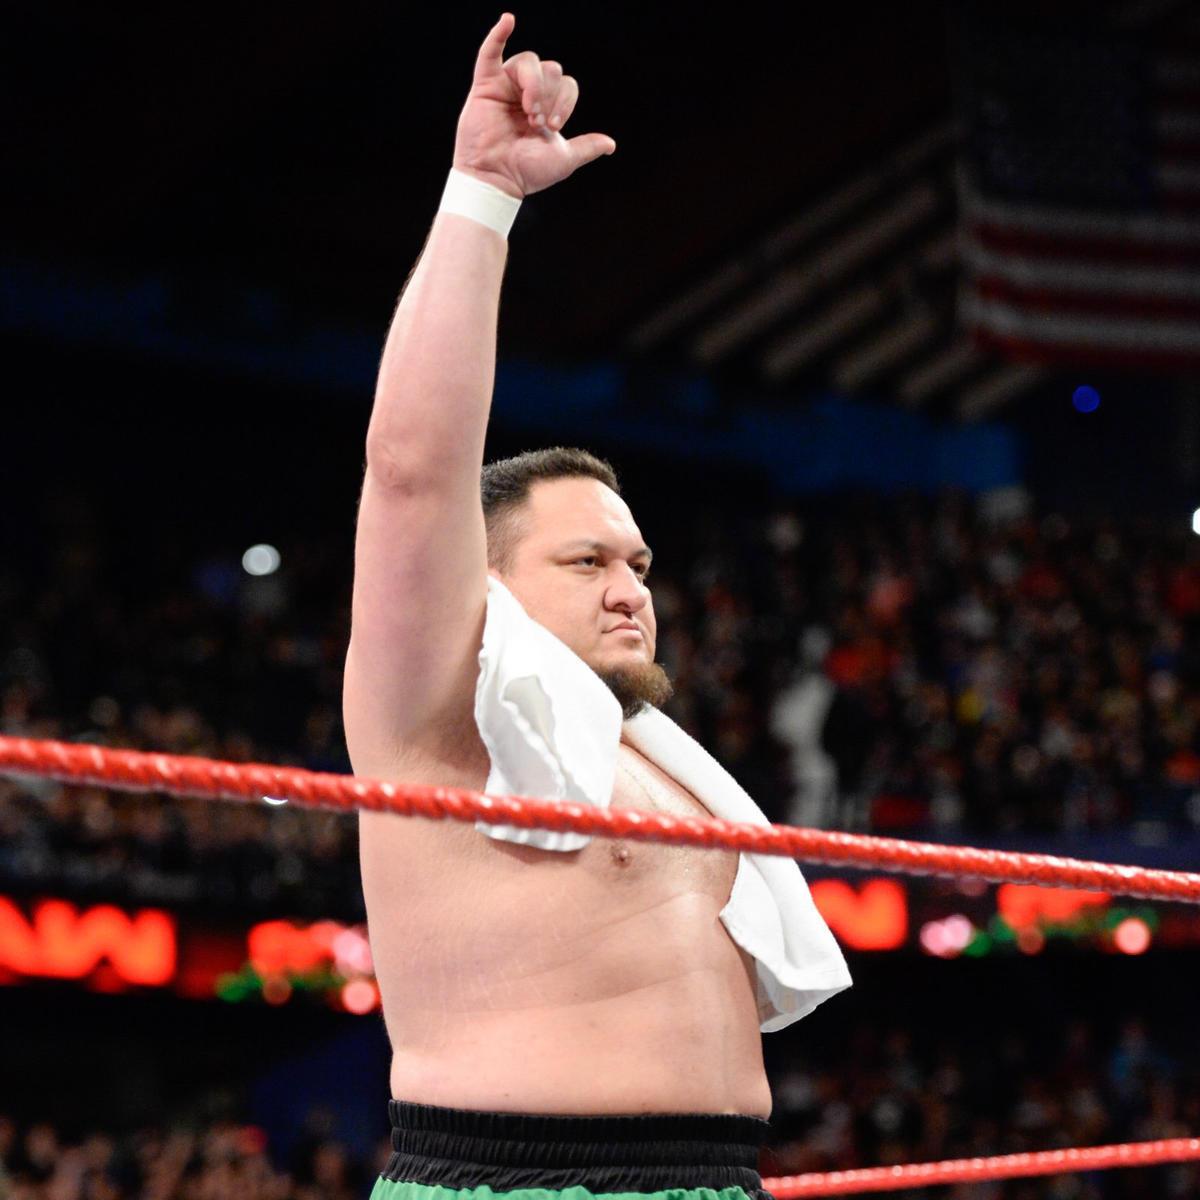 Resultado de imagen para samoa joe WWE